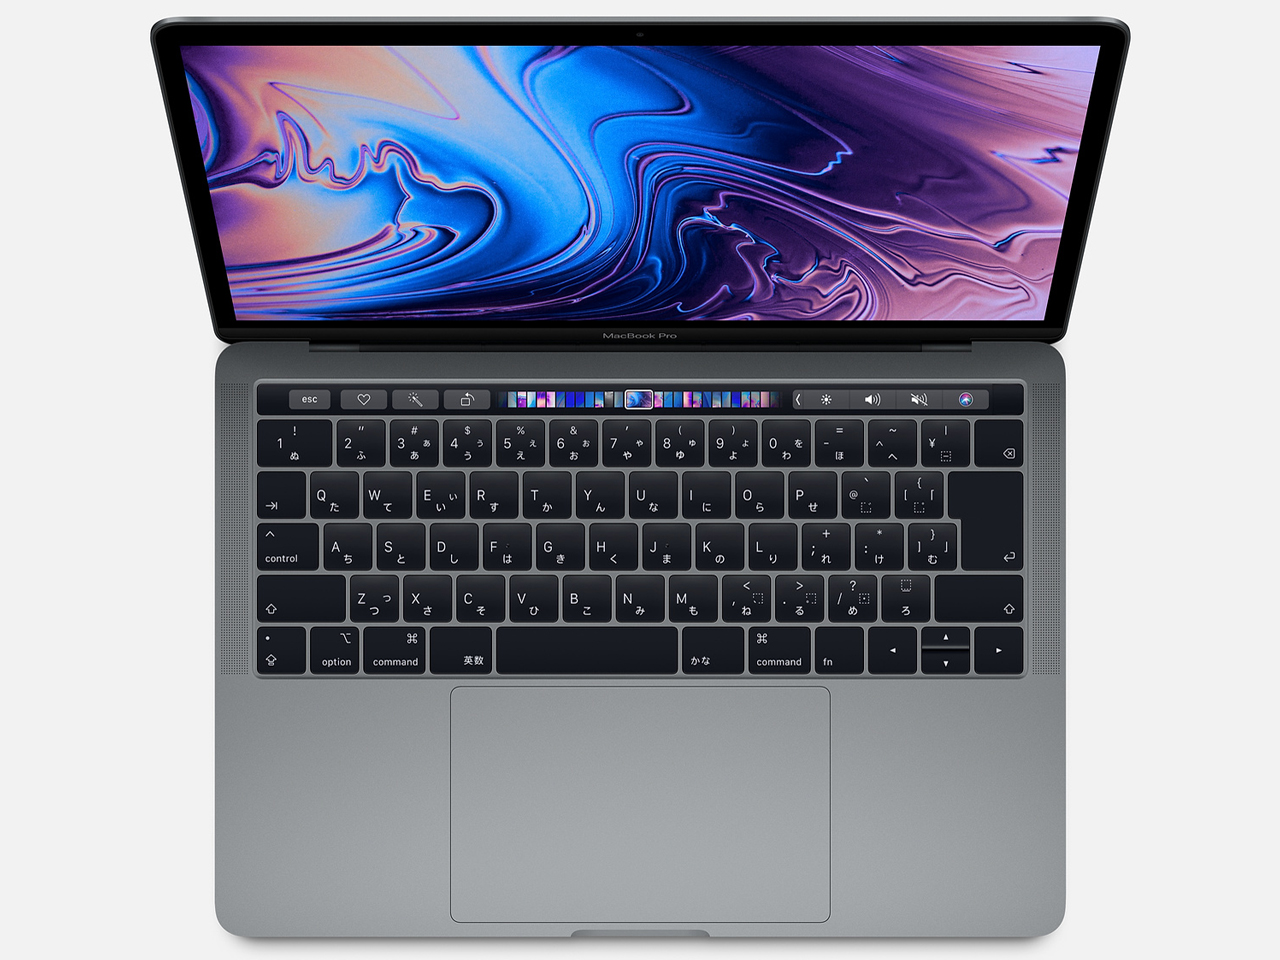 MacBook Pro Retinaディスプレイ 2400/13.3 MV972J/A [スペースグレイ]